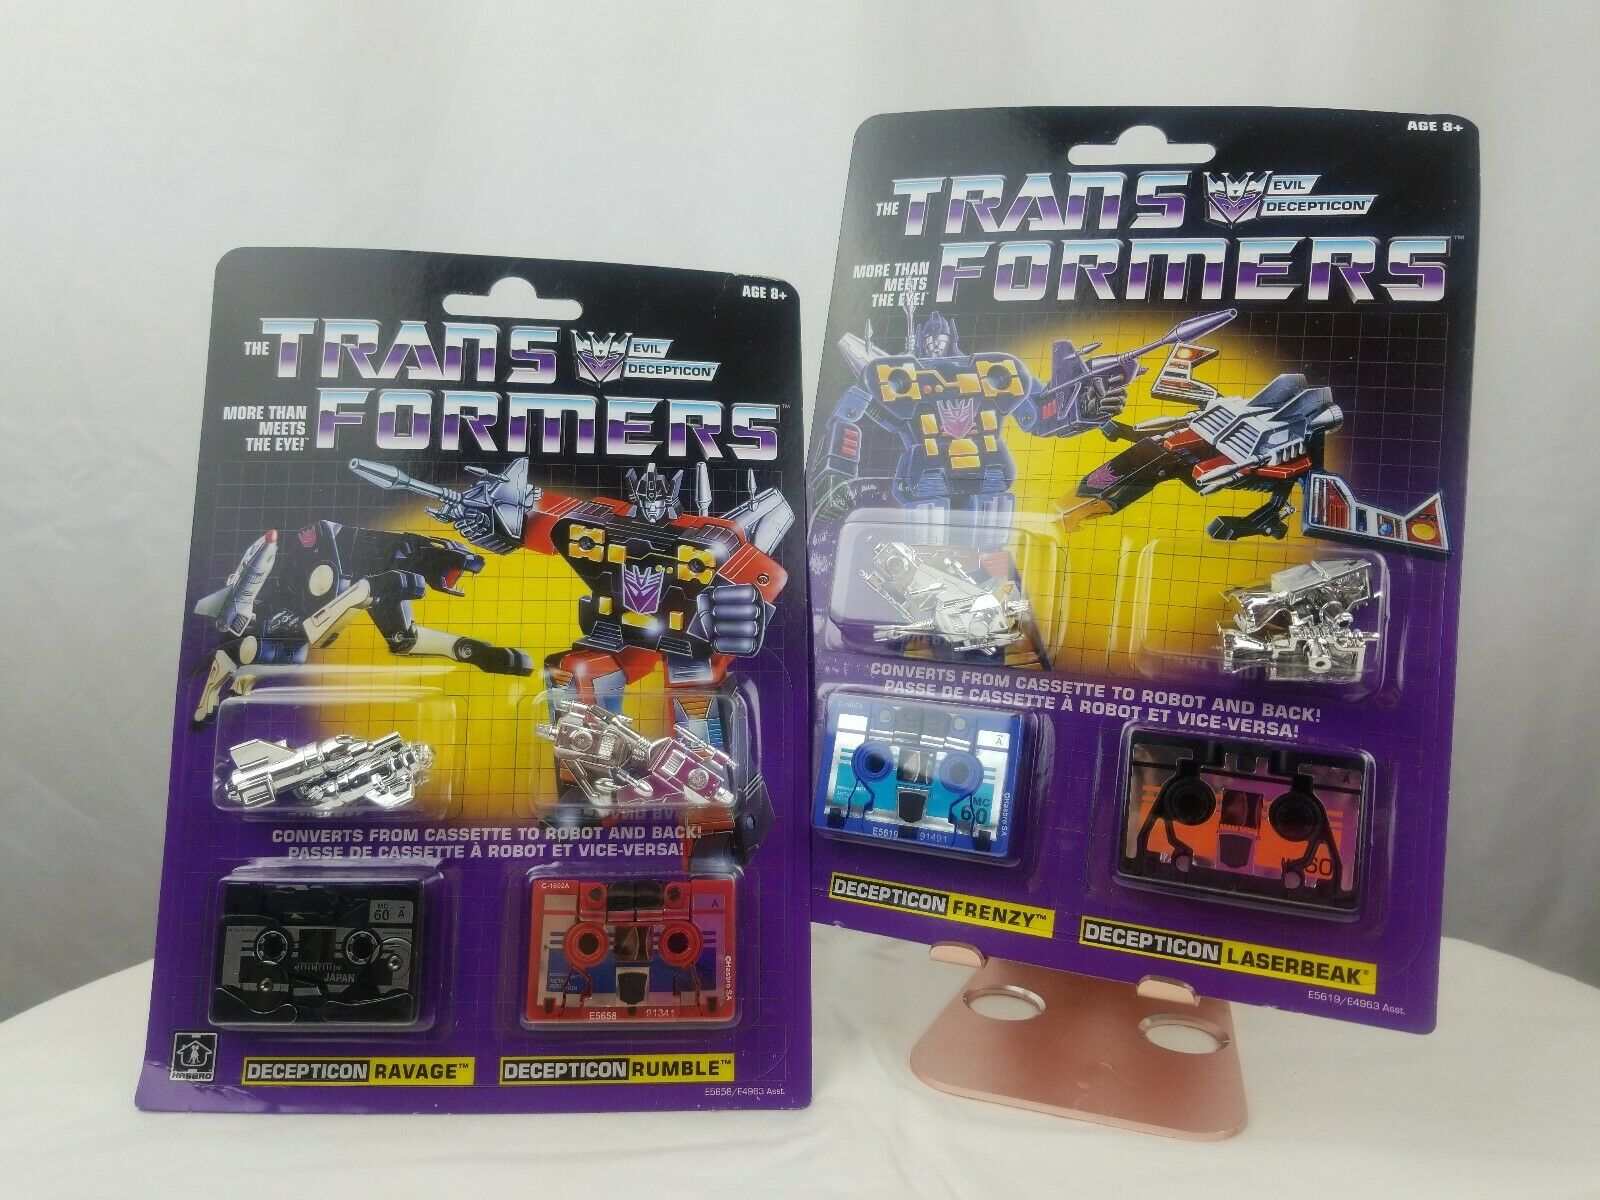 Transformers VINTAGE G1 cassetta dei Decepticon Frenzy GUFO è DEVASTA Rumble